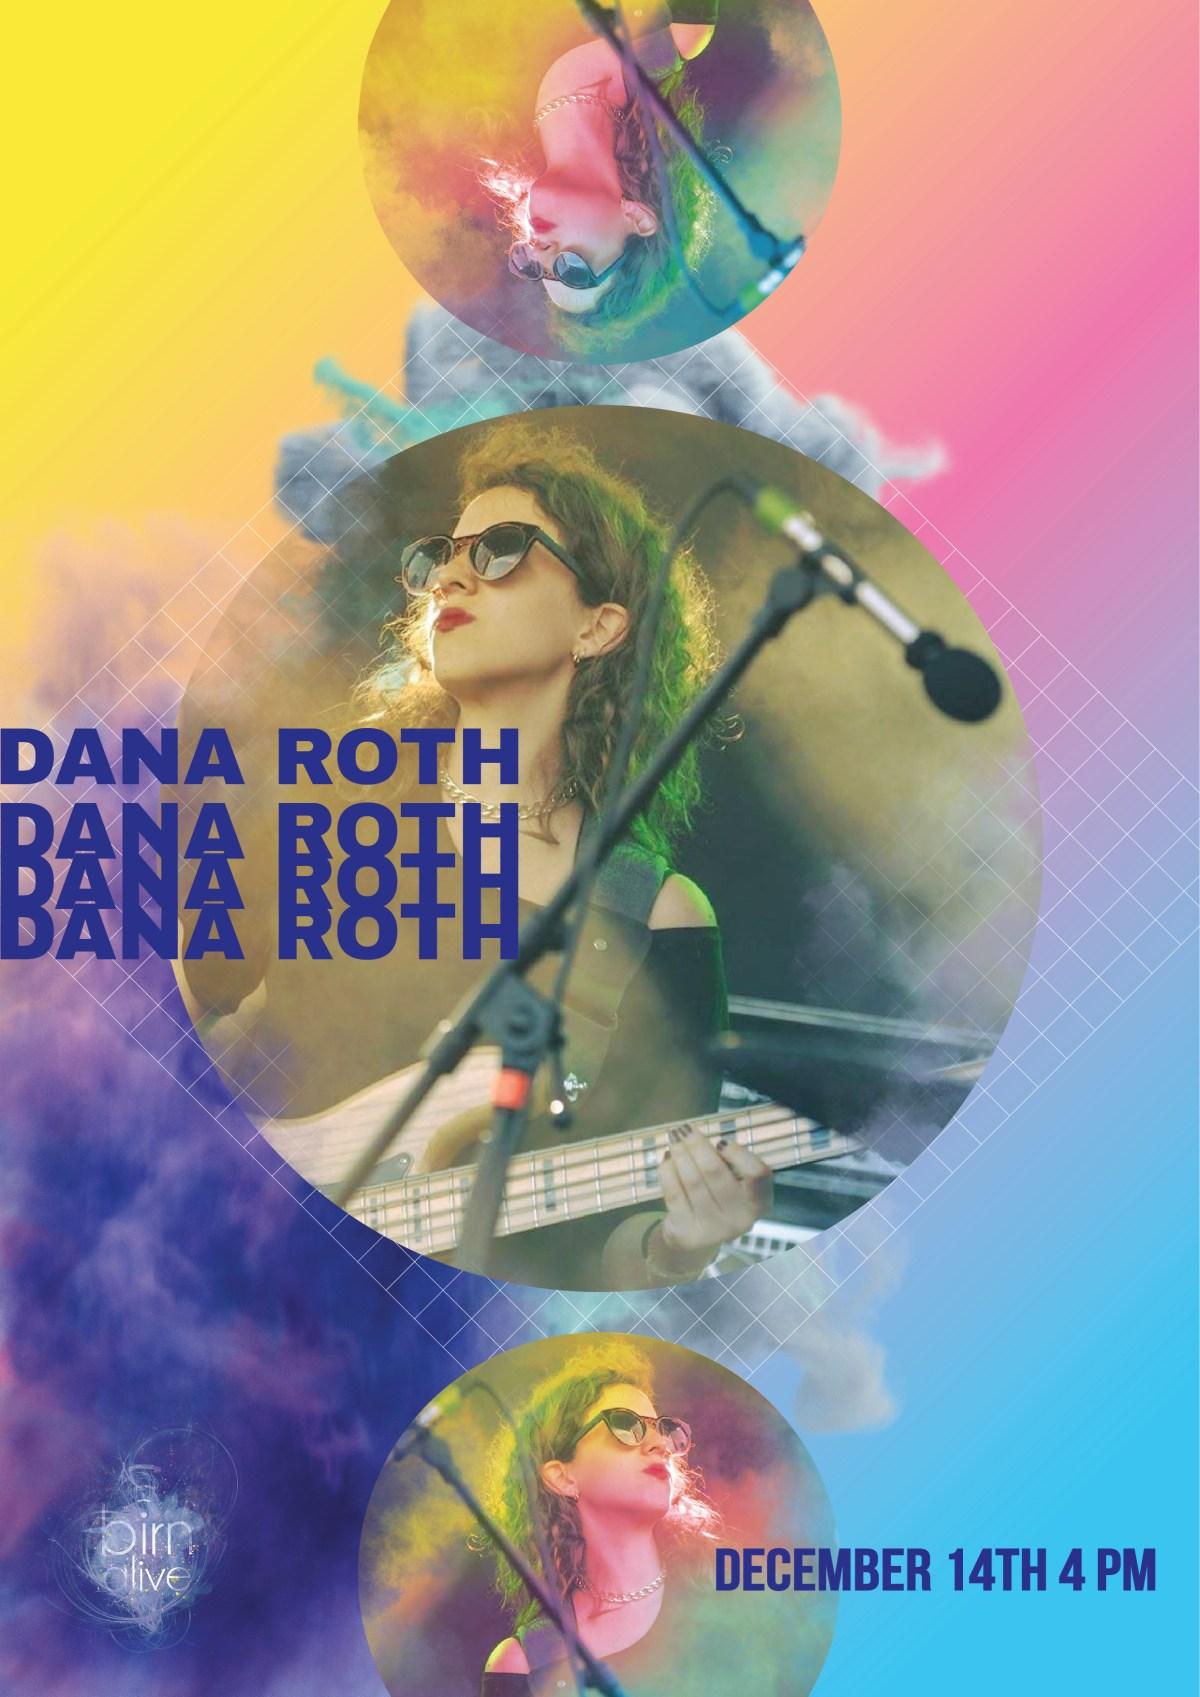 The Dana Roth Group plays BIRN Alive